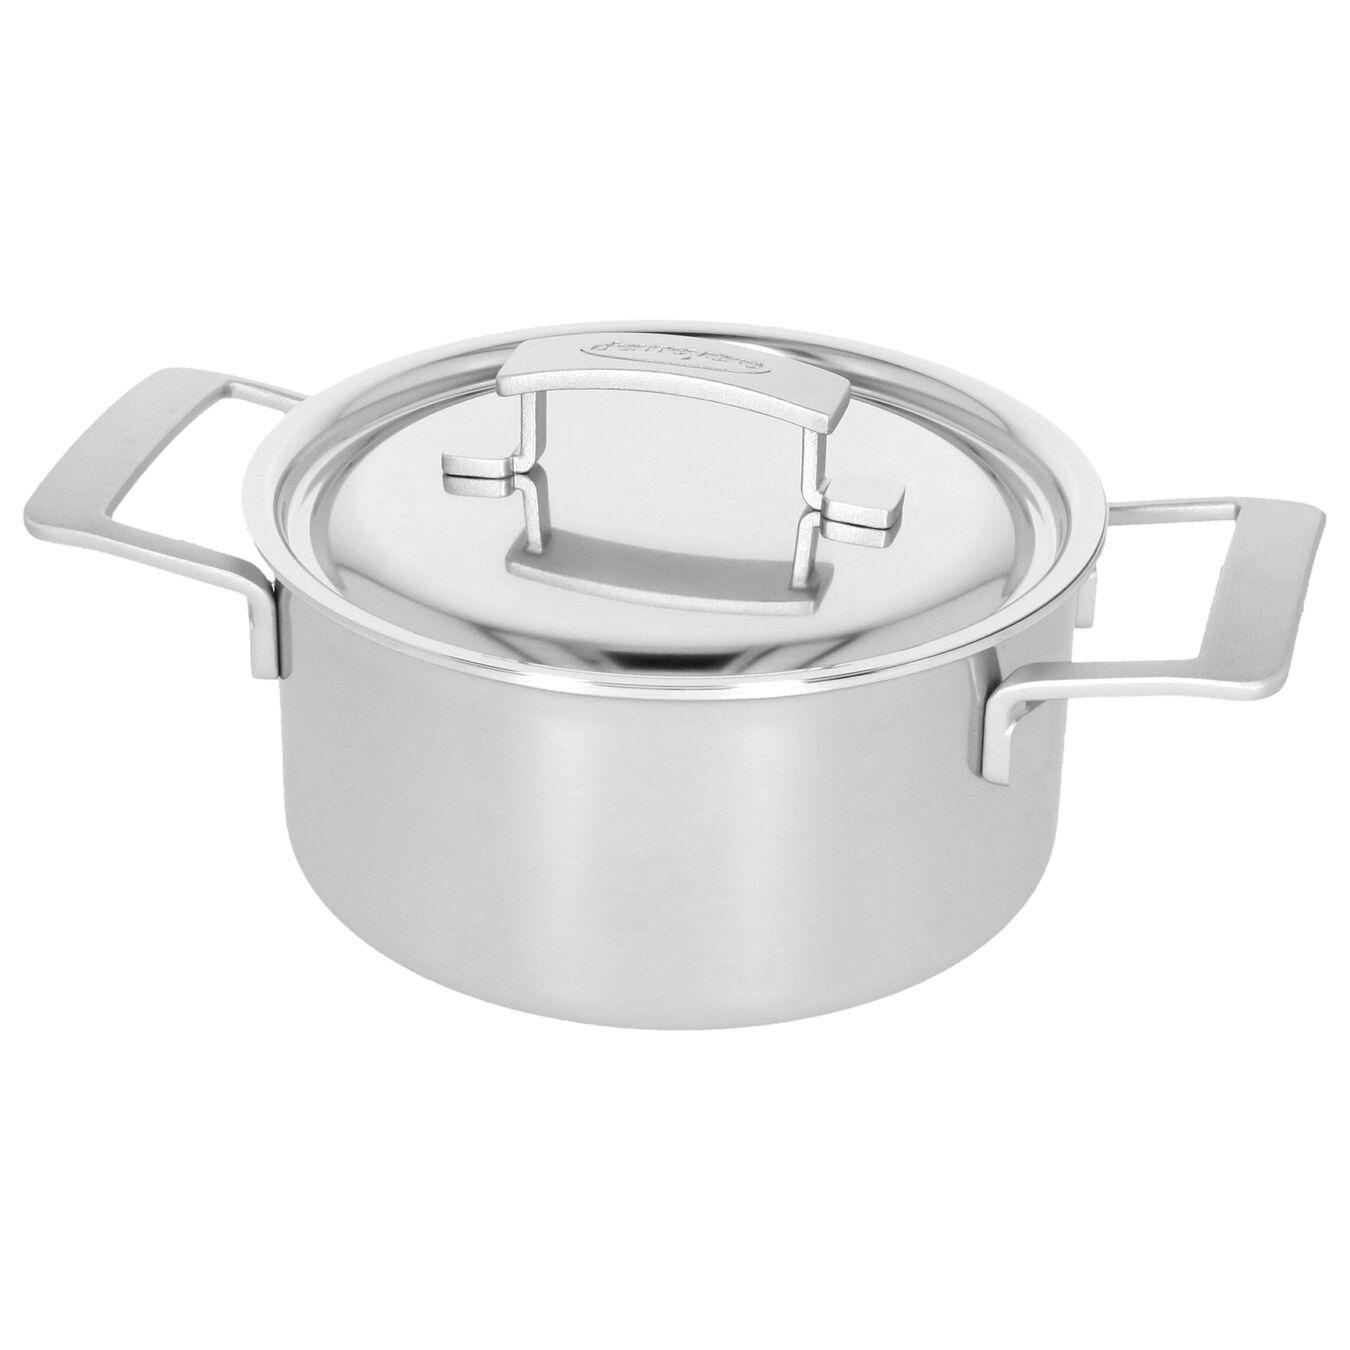 Kookpot met deksel 20 cm / 3 l,,large 6